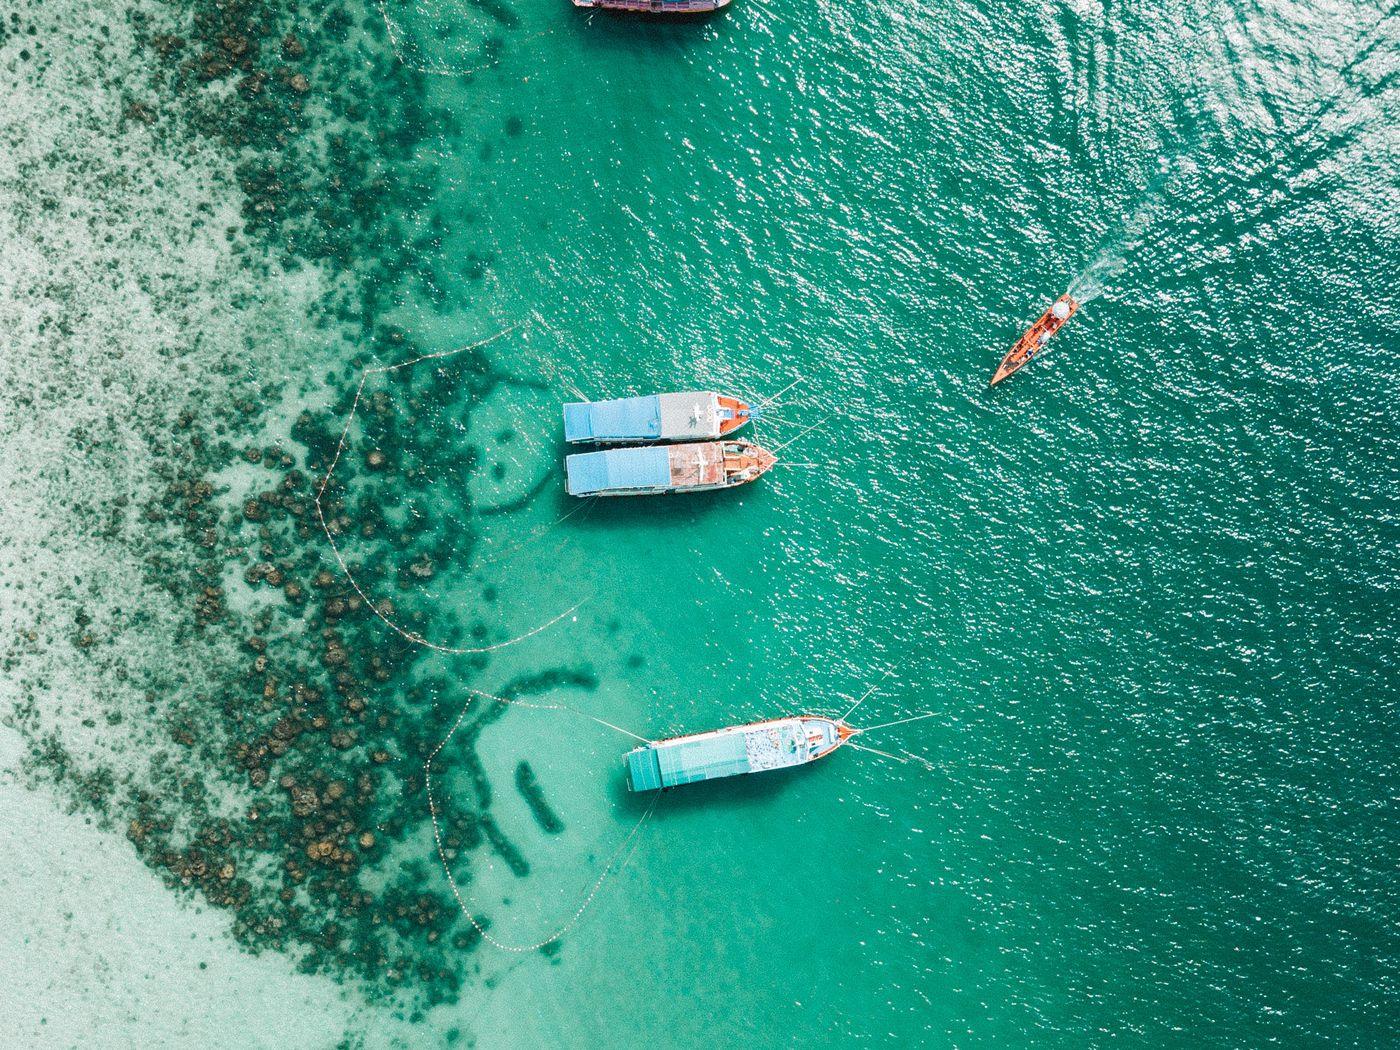 1400x1050 Wallpaper shore, boats, sandbar, ocean, moored, aerial view